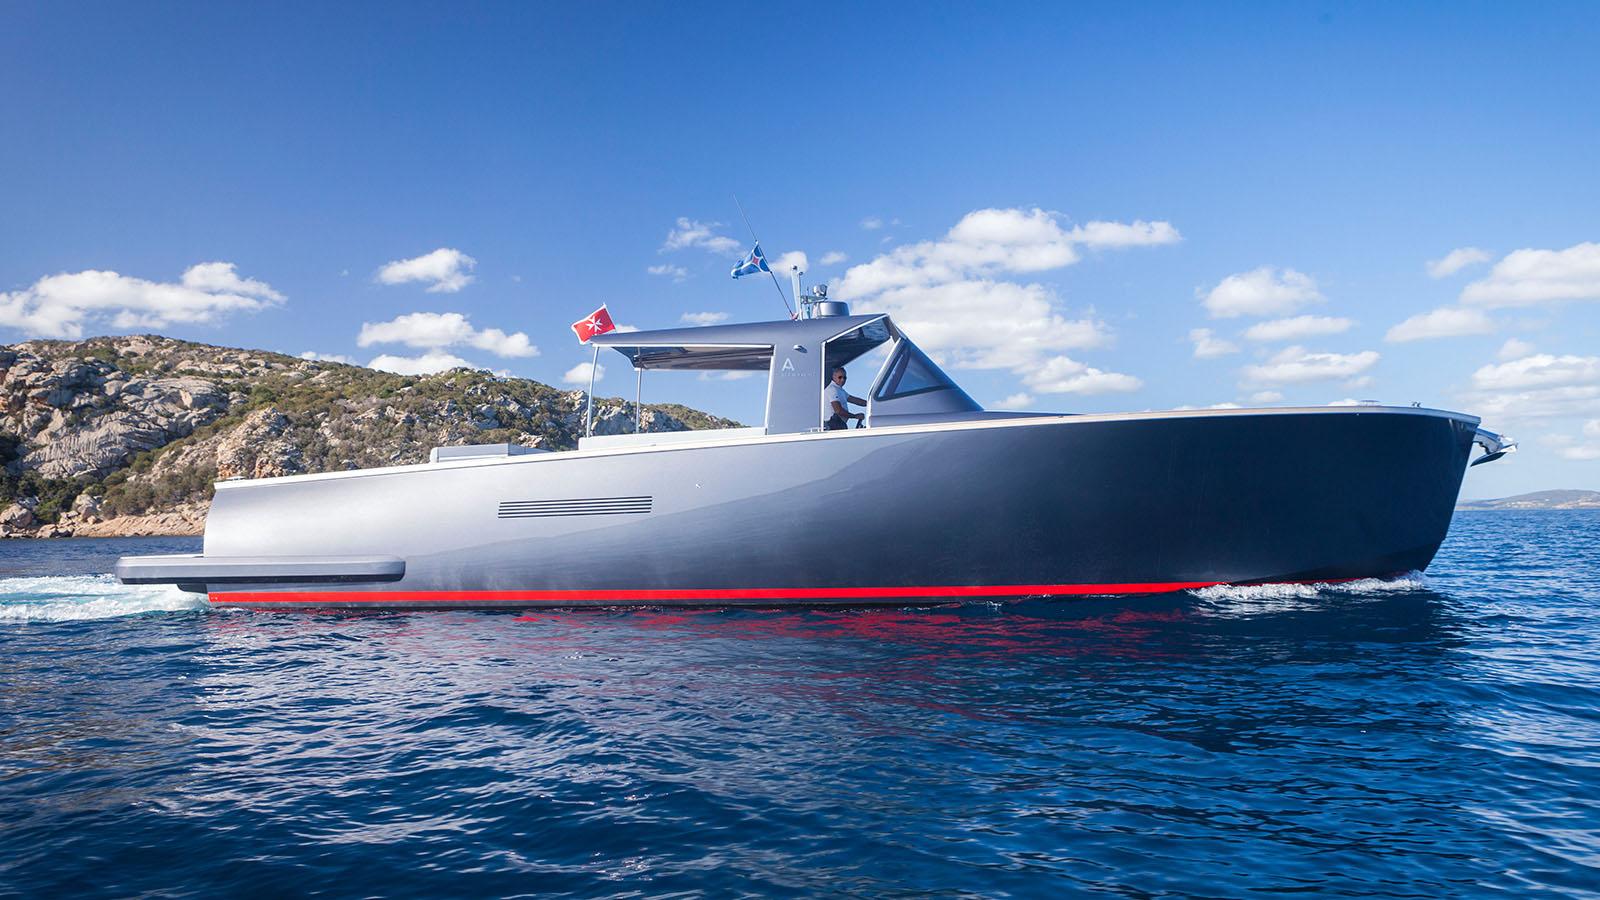 Sabbia Yacht for Sale - IYC